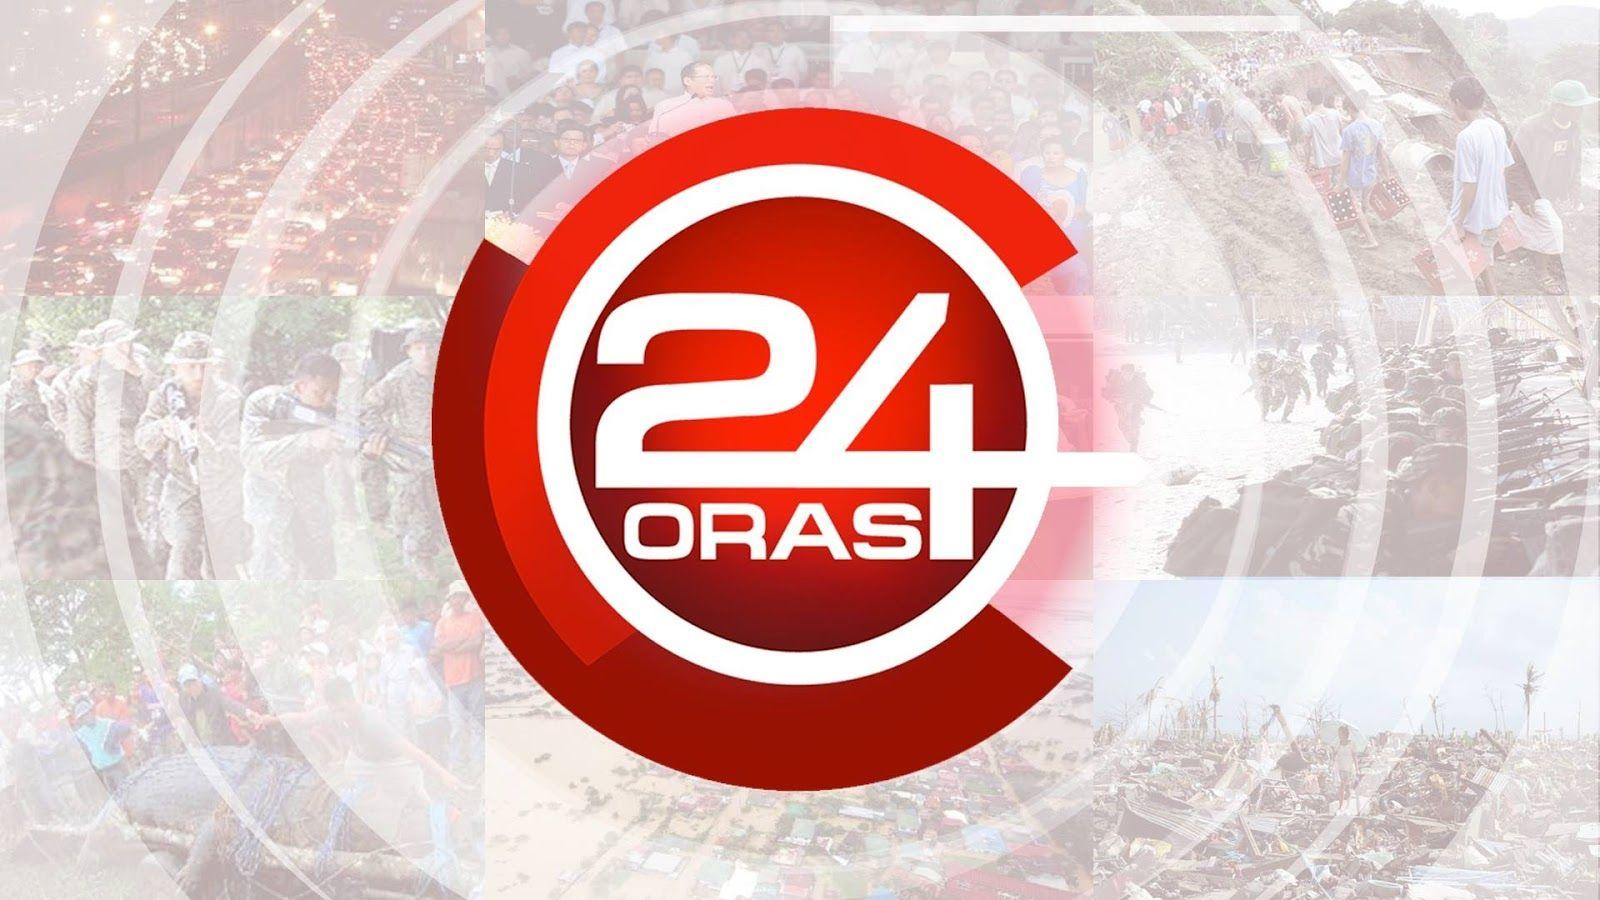 24 Oras November 29 2016 Oras, Gma network, Pinoy